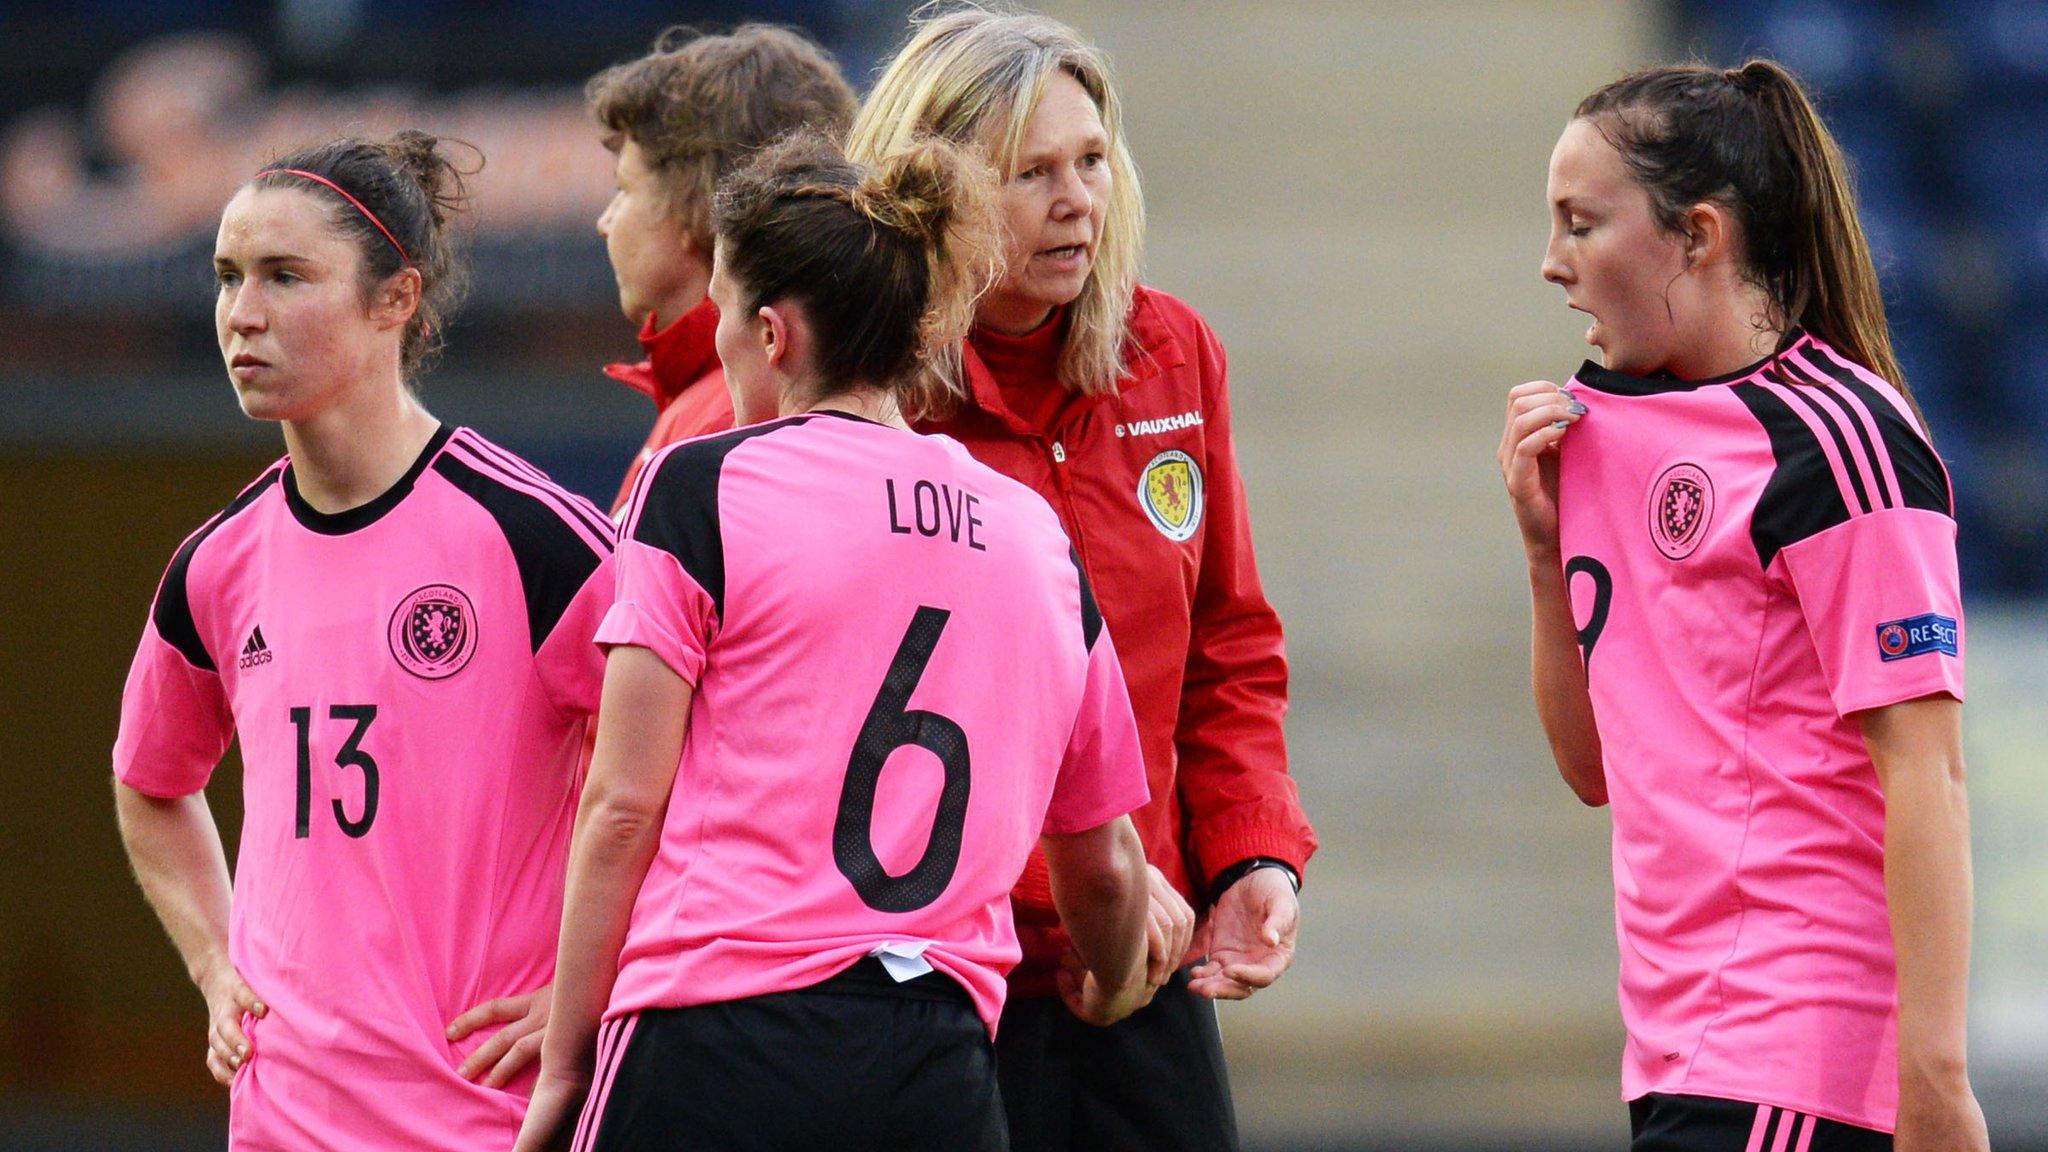 Scotland women thrashed by Belgium